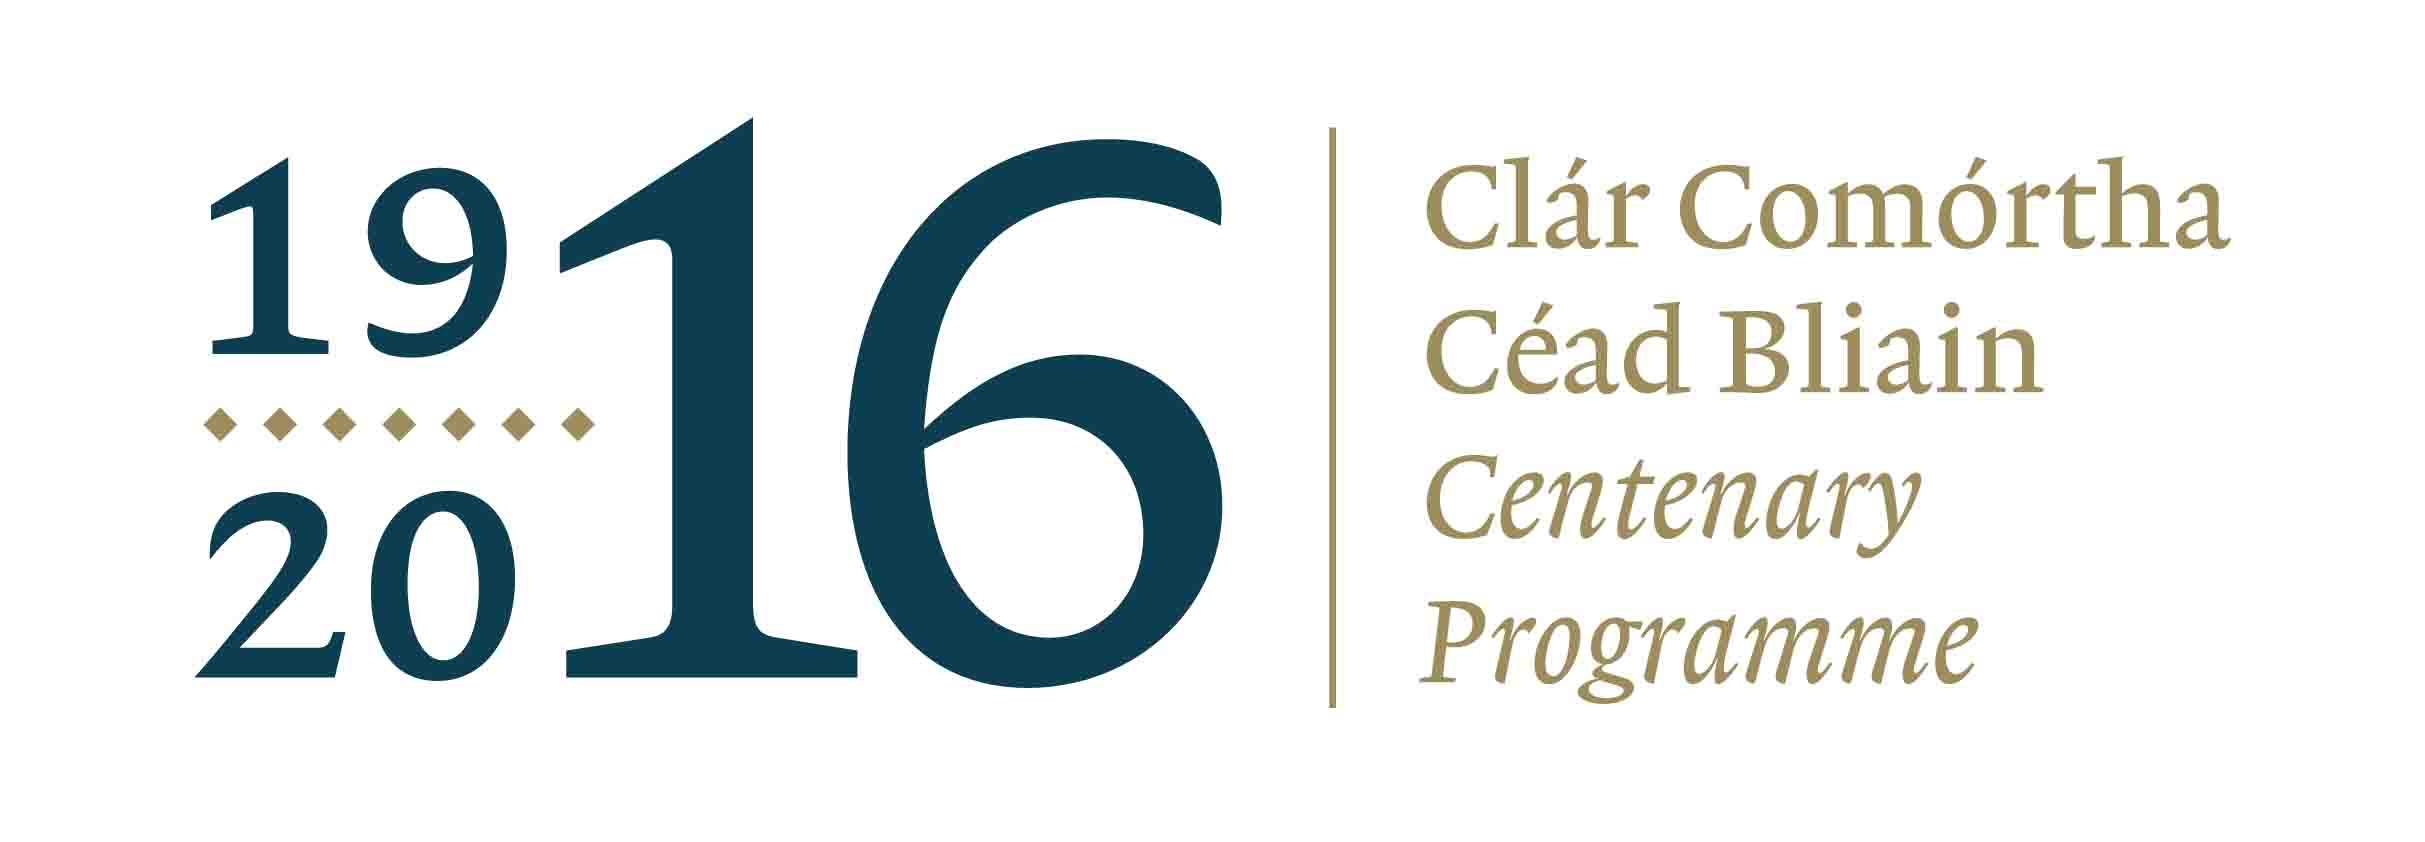 Centenary-1916-logo